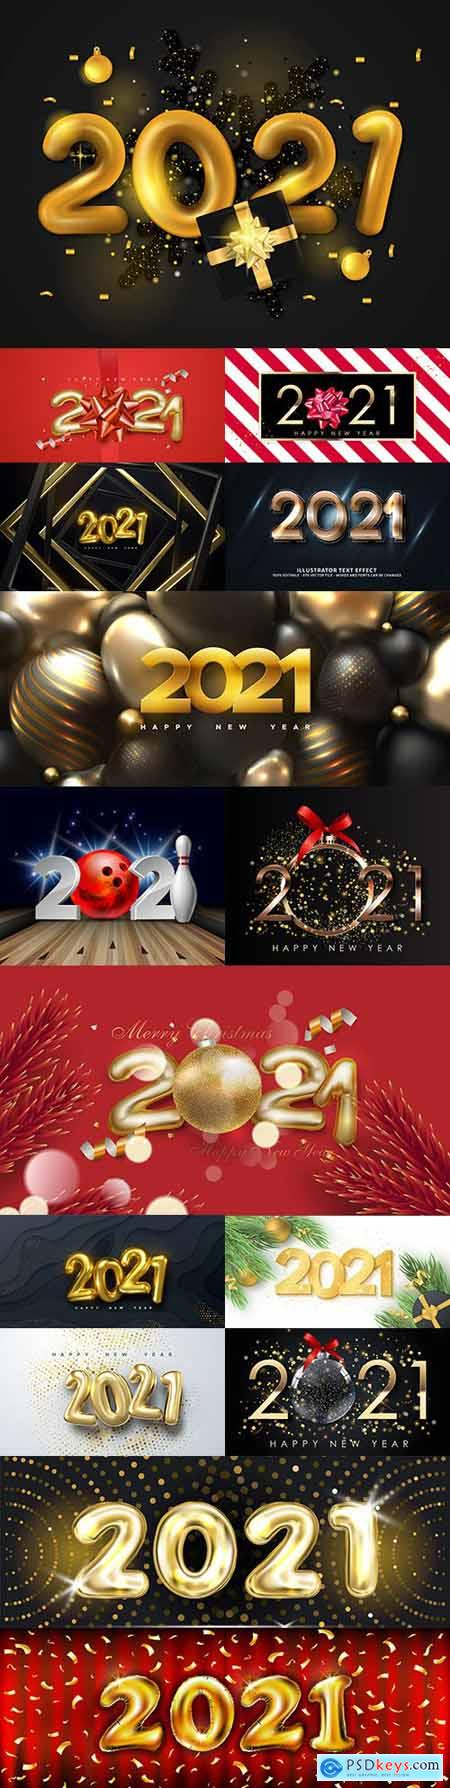 2021 New Years illustrations Festive design inscription 5